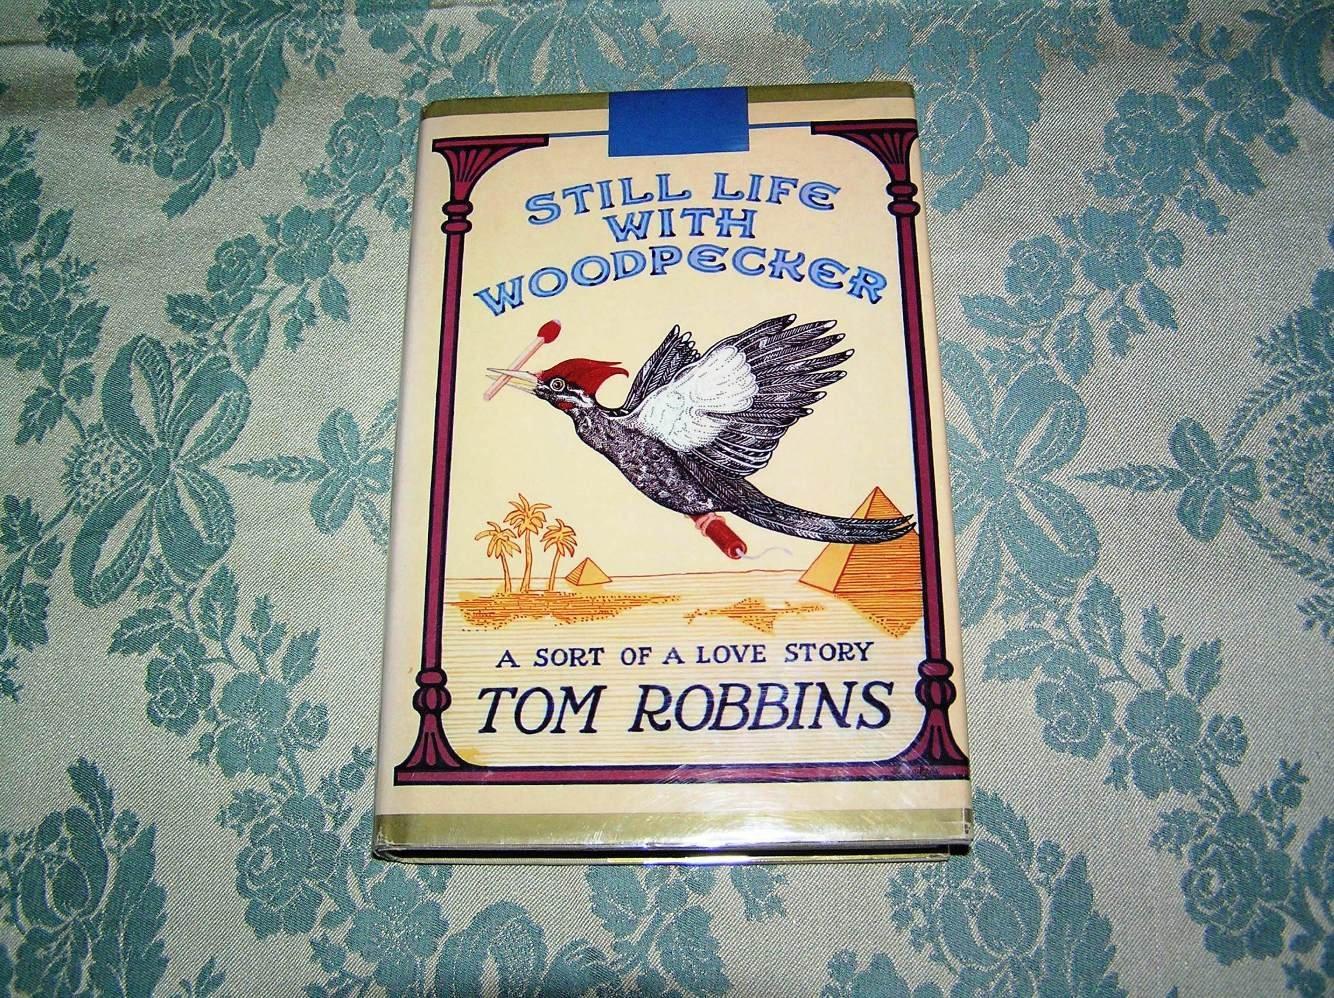 Still life with Woodpecker, Robbins, Tom